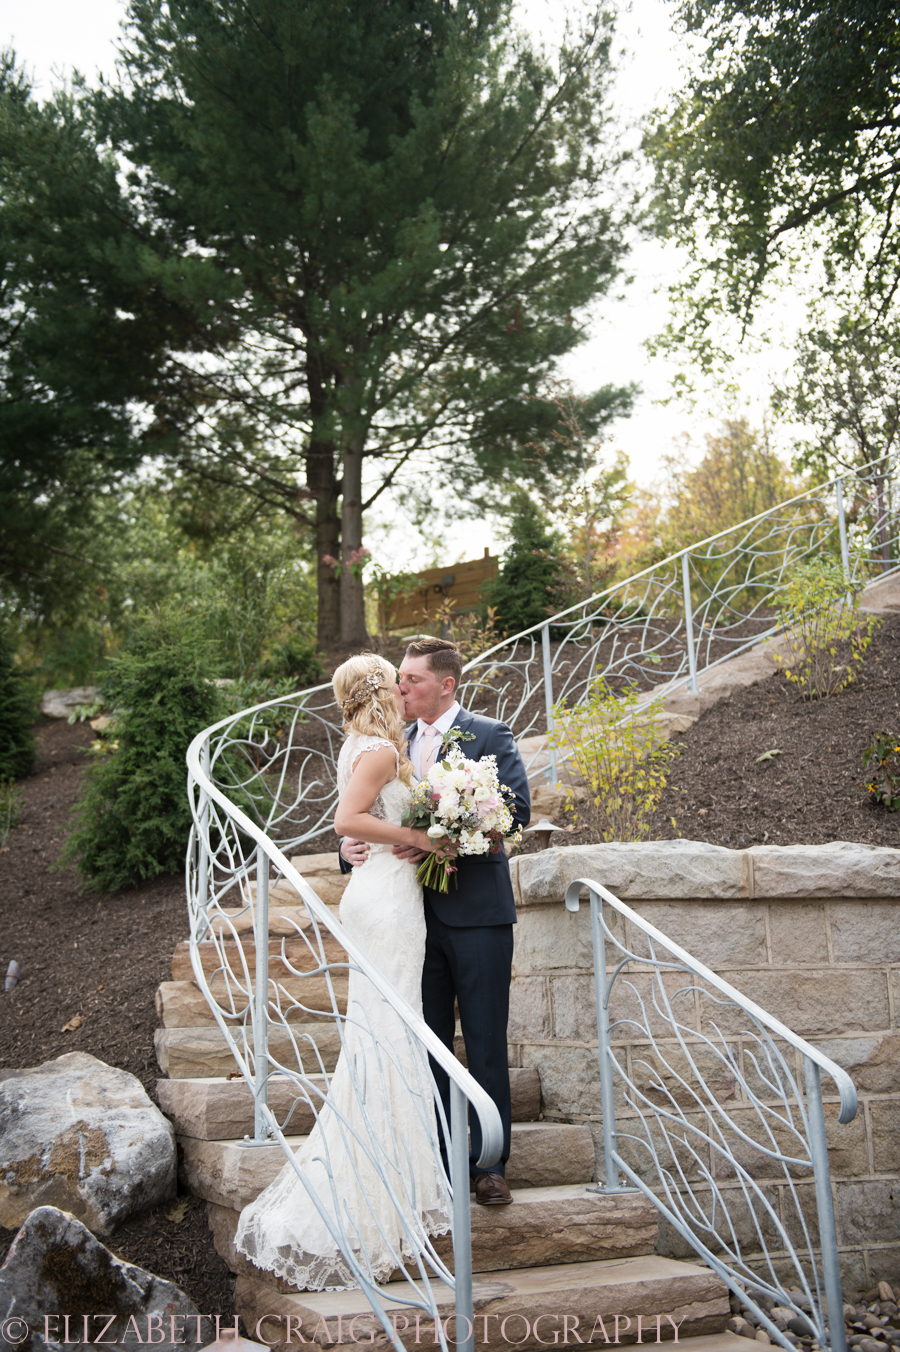 Dubois Brockway St. Marys PA Weddings-0112